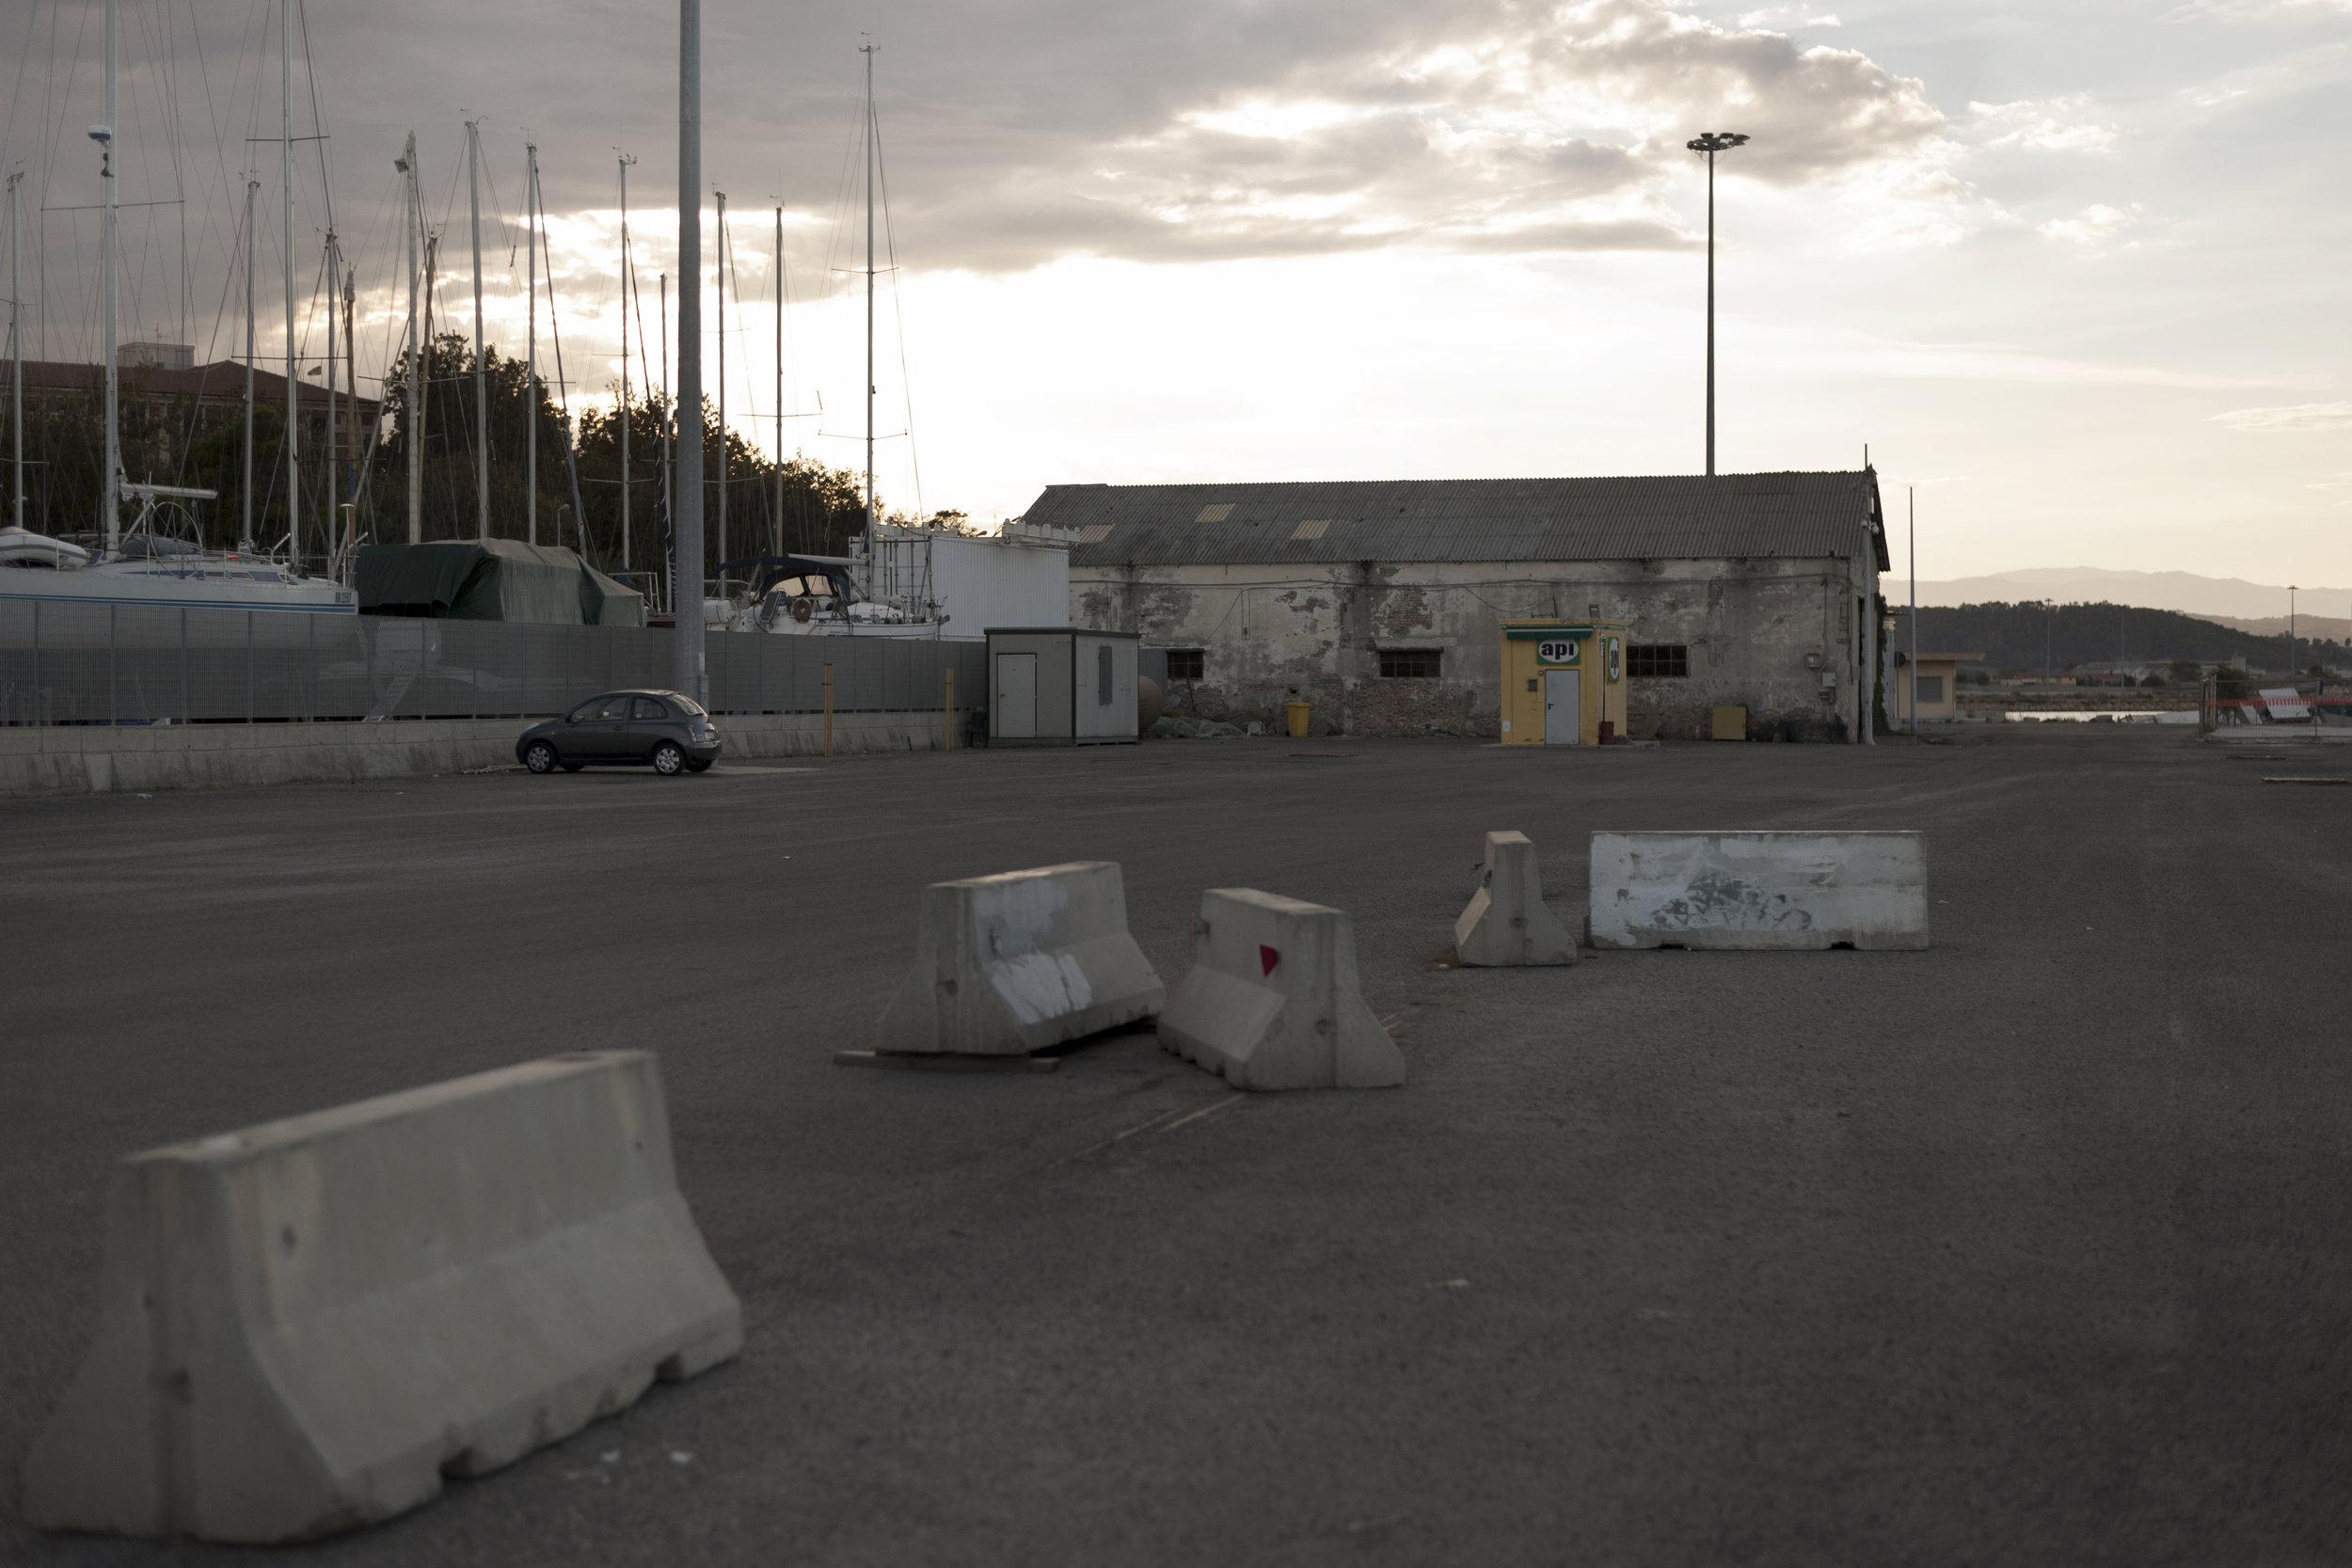 Crotone08_Amato_2013.jpg